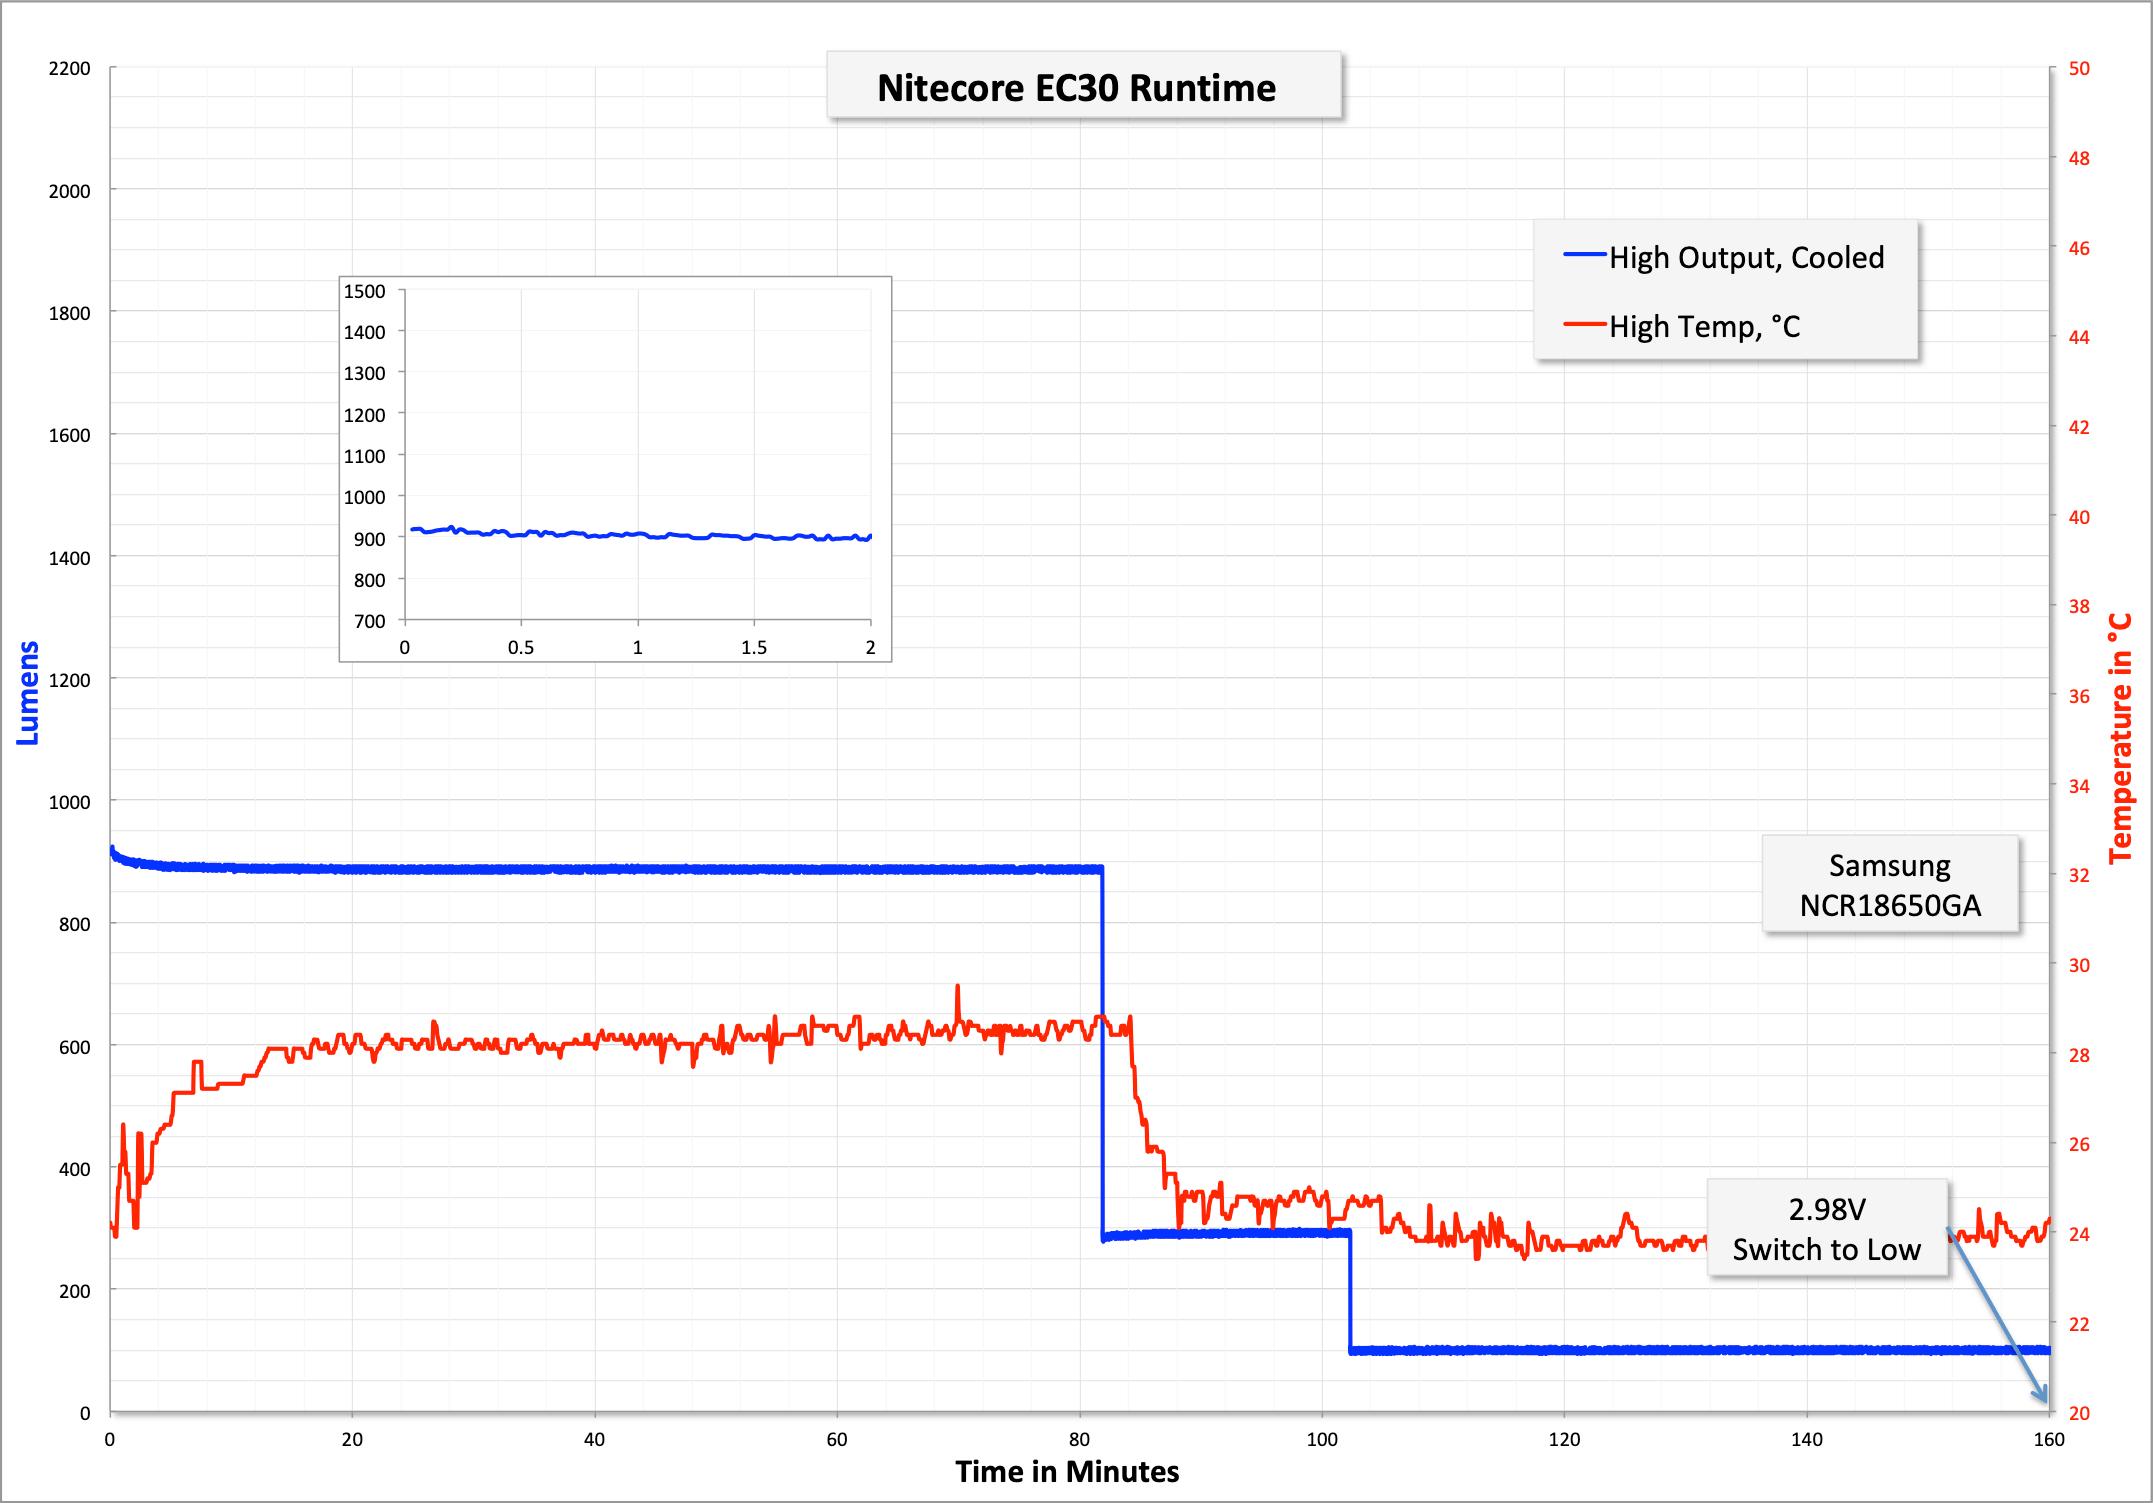 zeroair_reviews_nitecore_ec30_18650_35.png